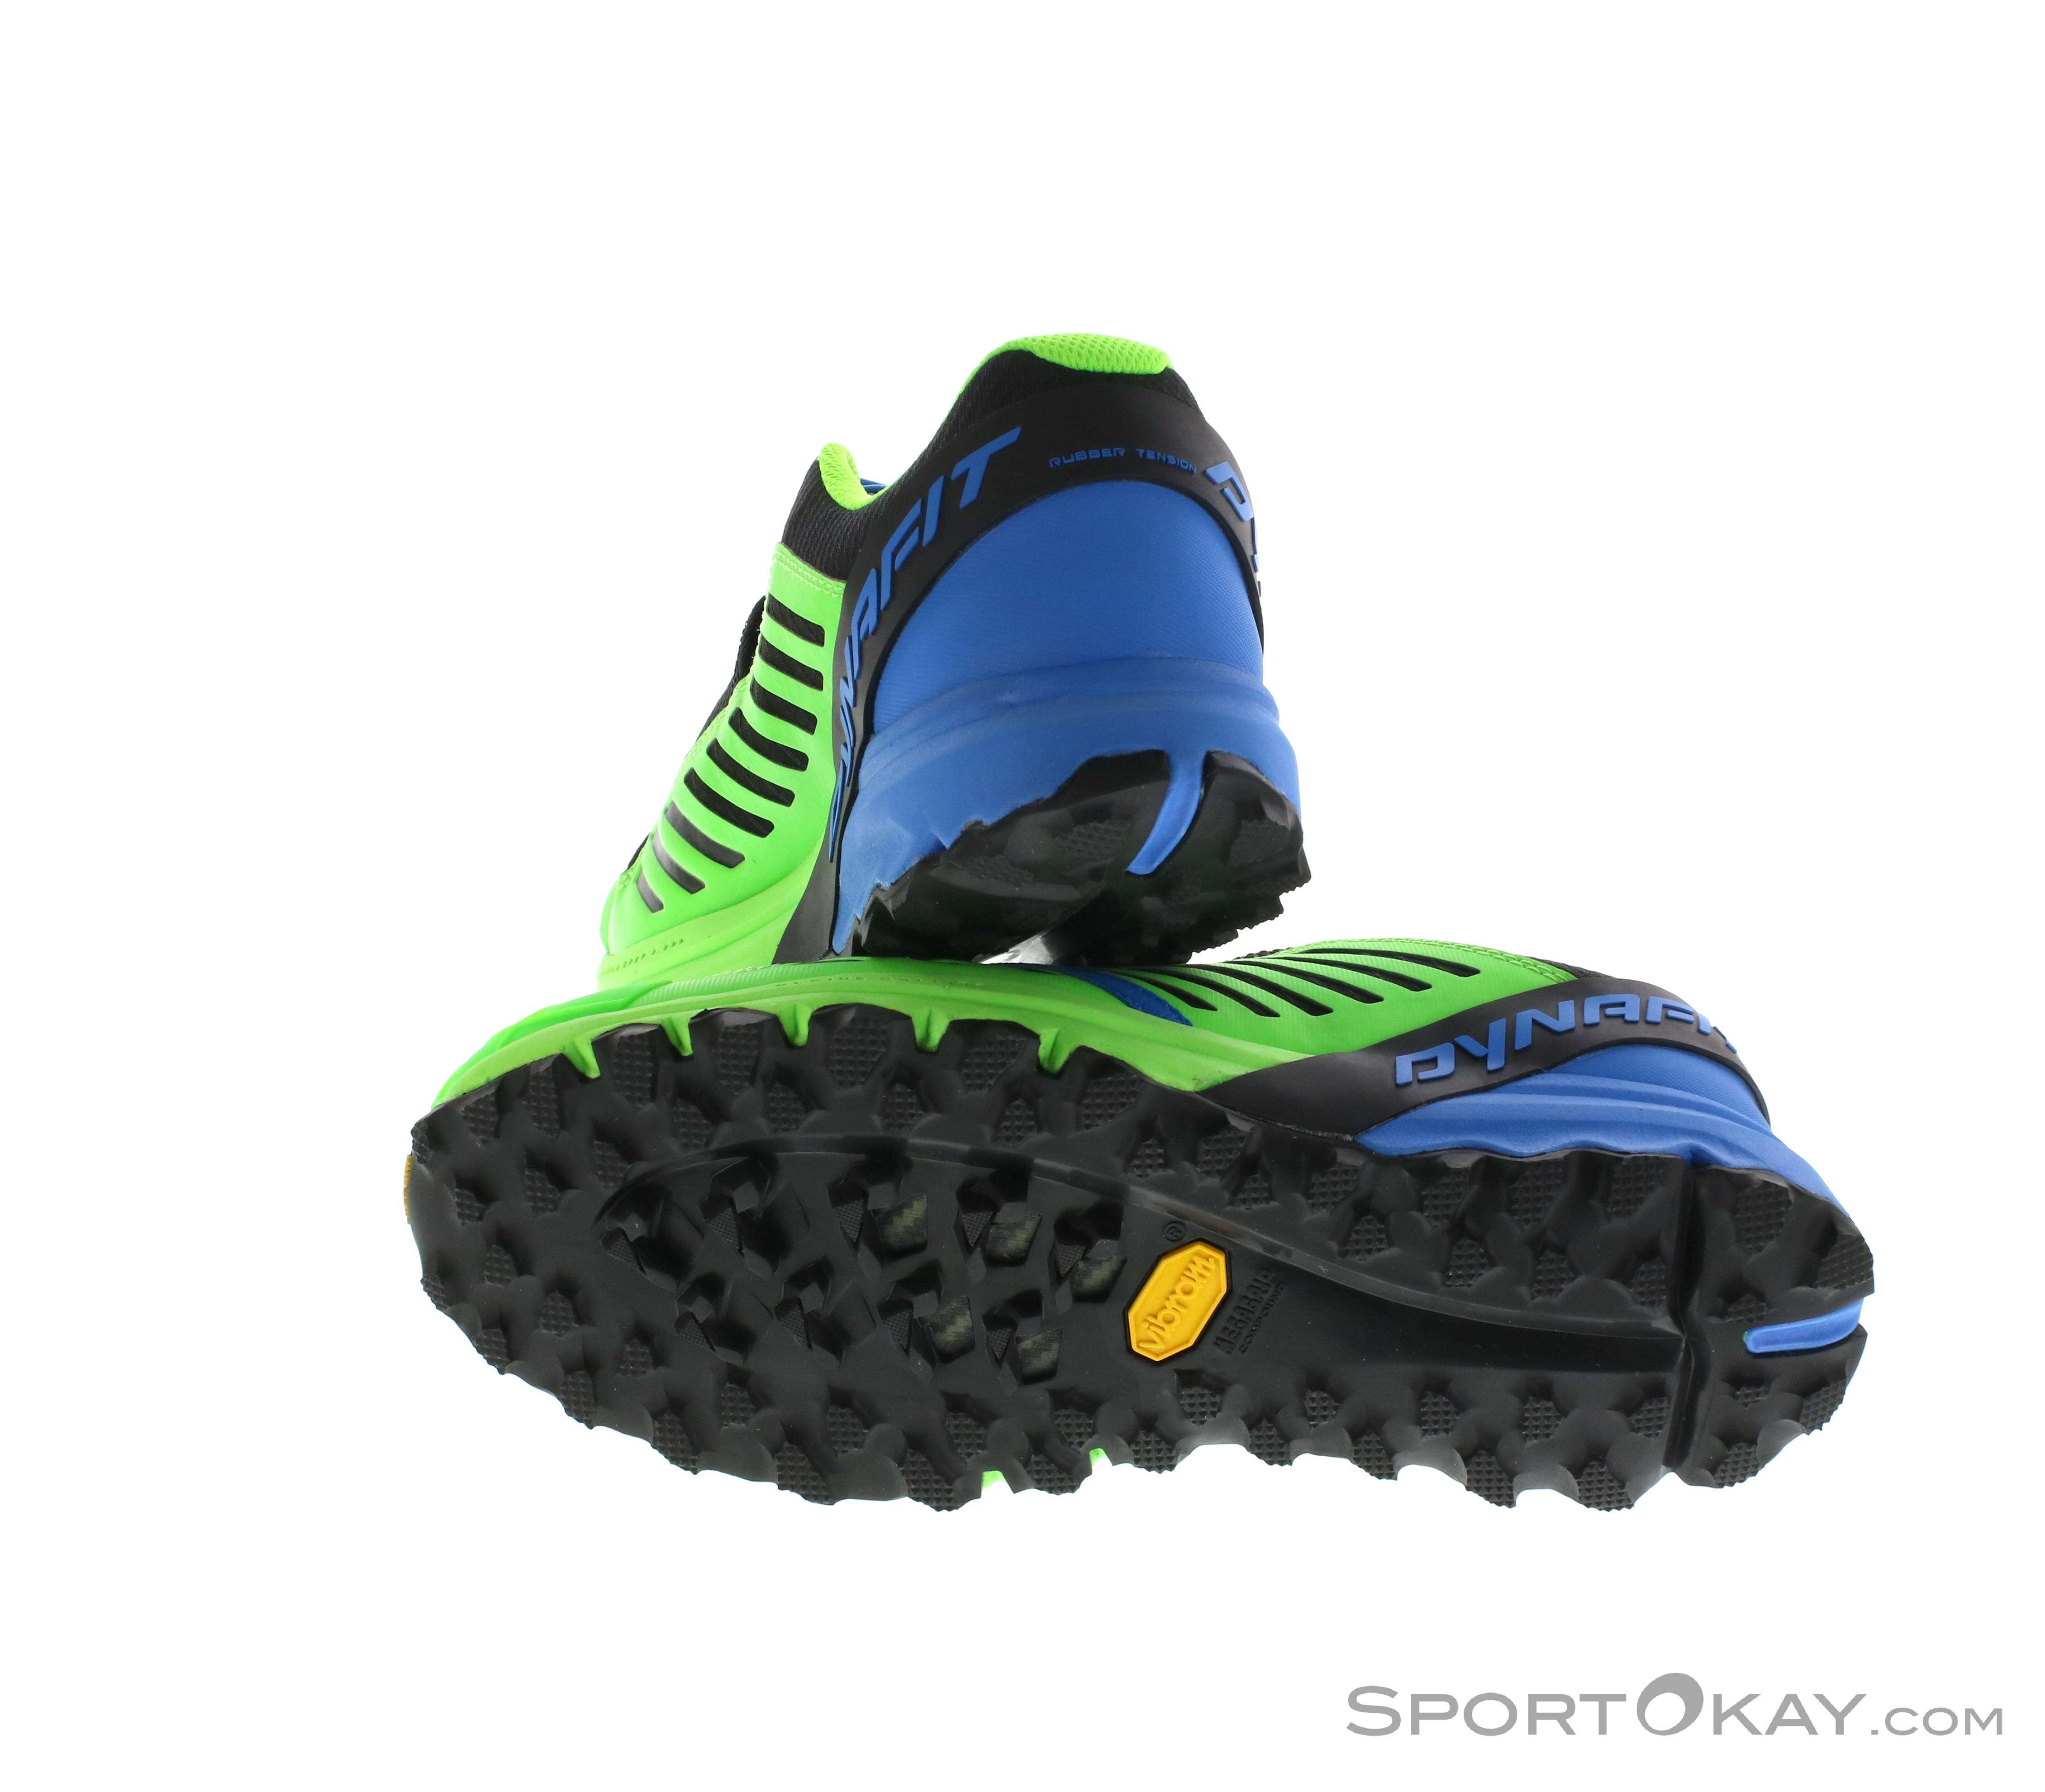 Dynafit Alpine Pro Mens Trail Running Shoes Tensimeter Digital Wristband Blue Male 0015